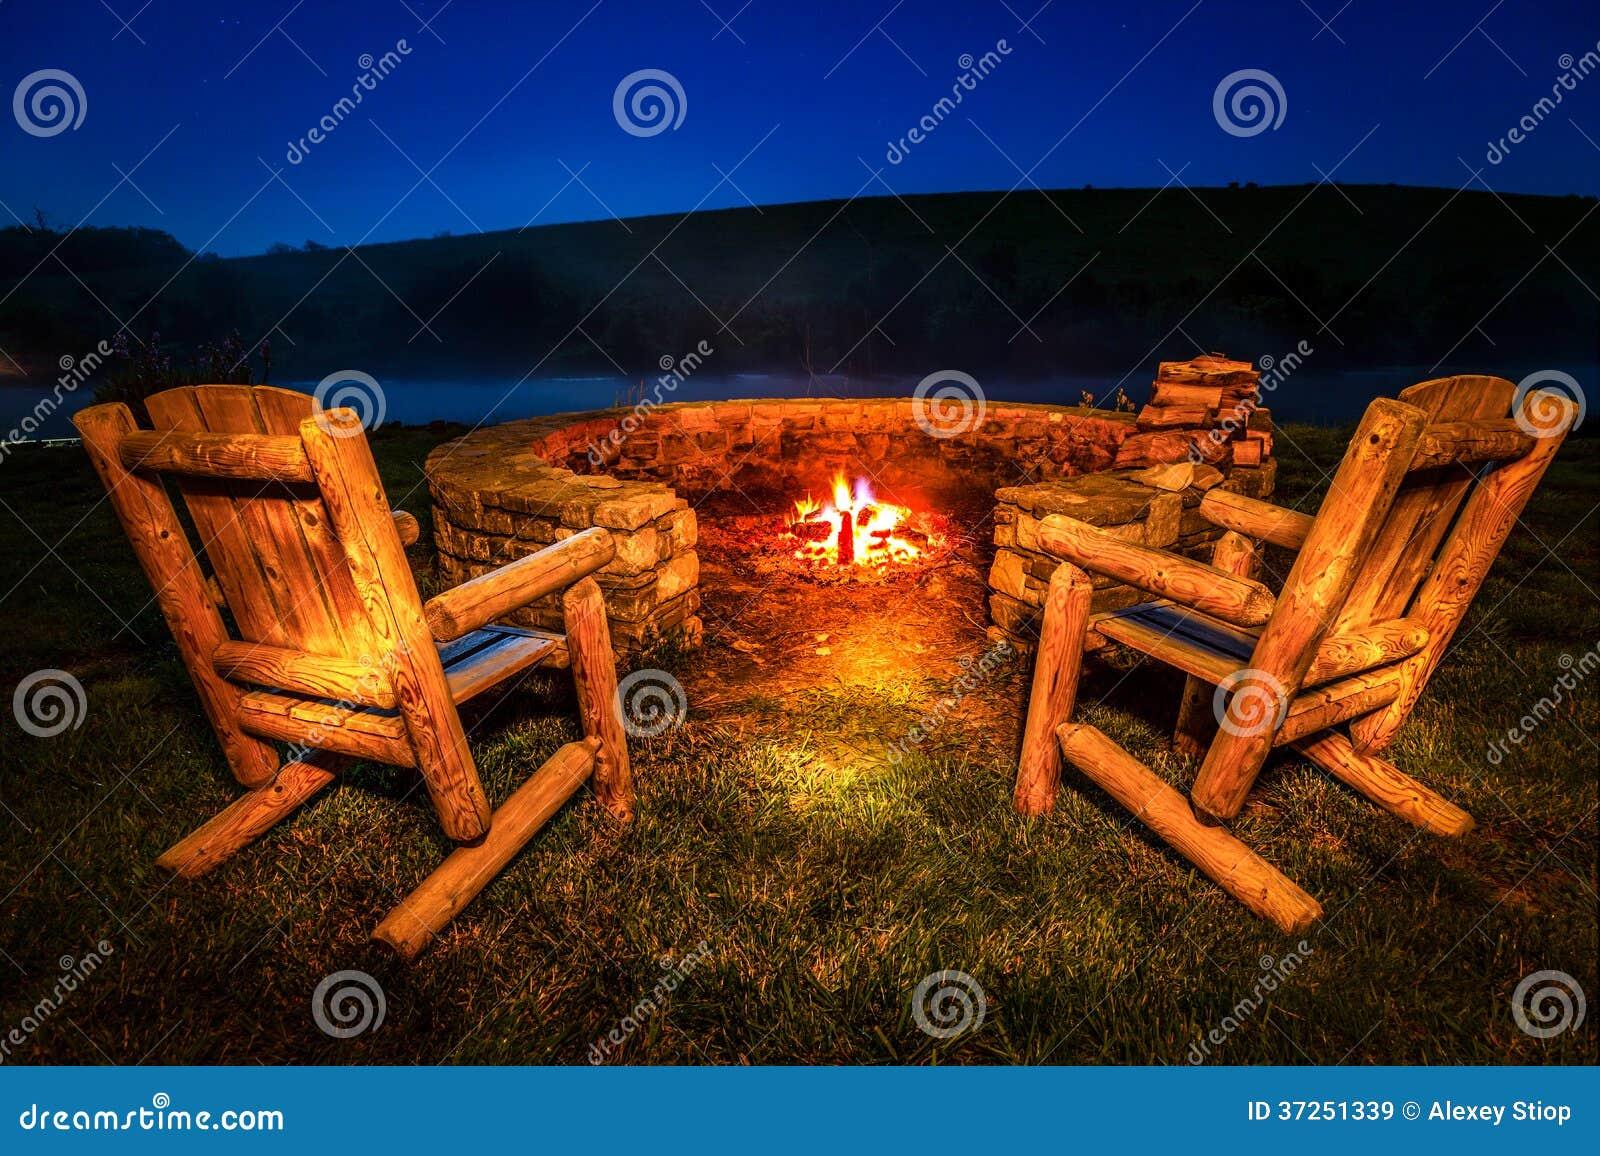 Bonfire royalty free stock images image 37251339